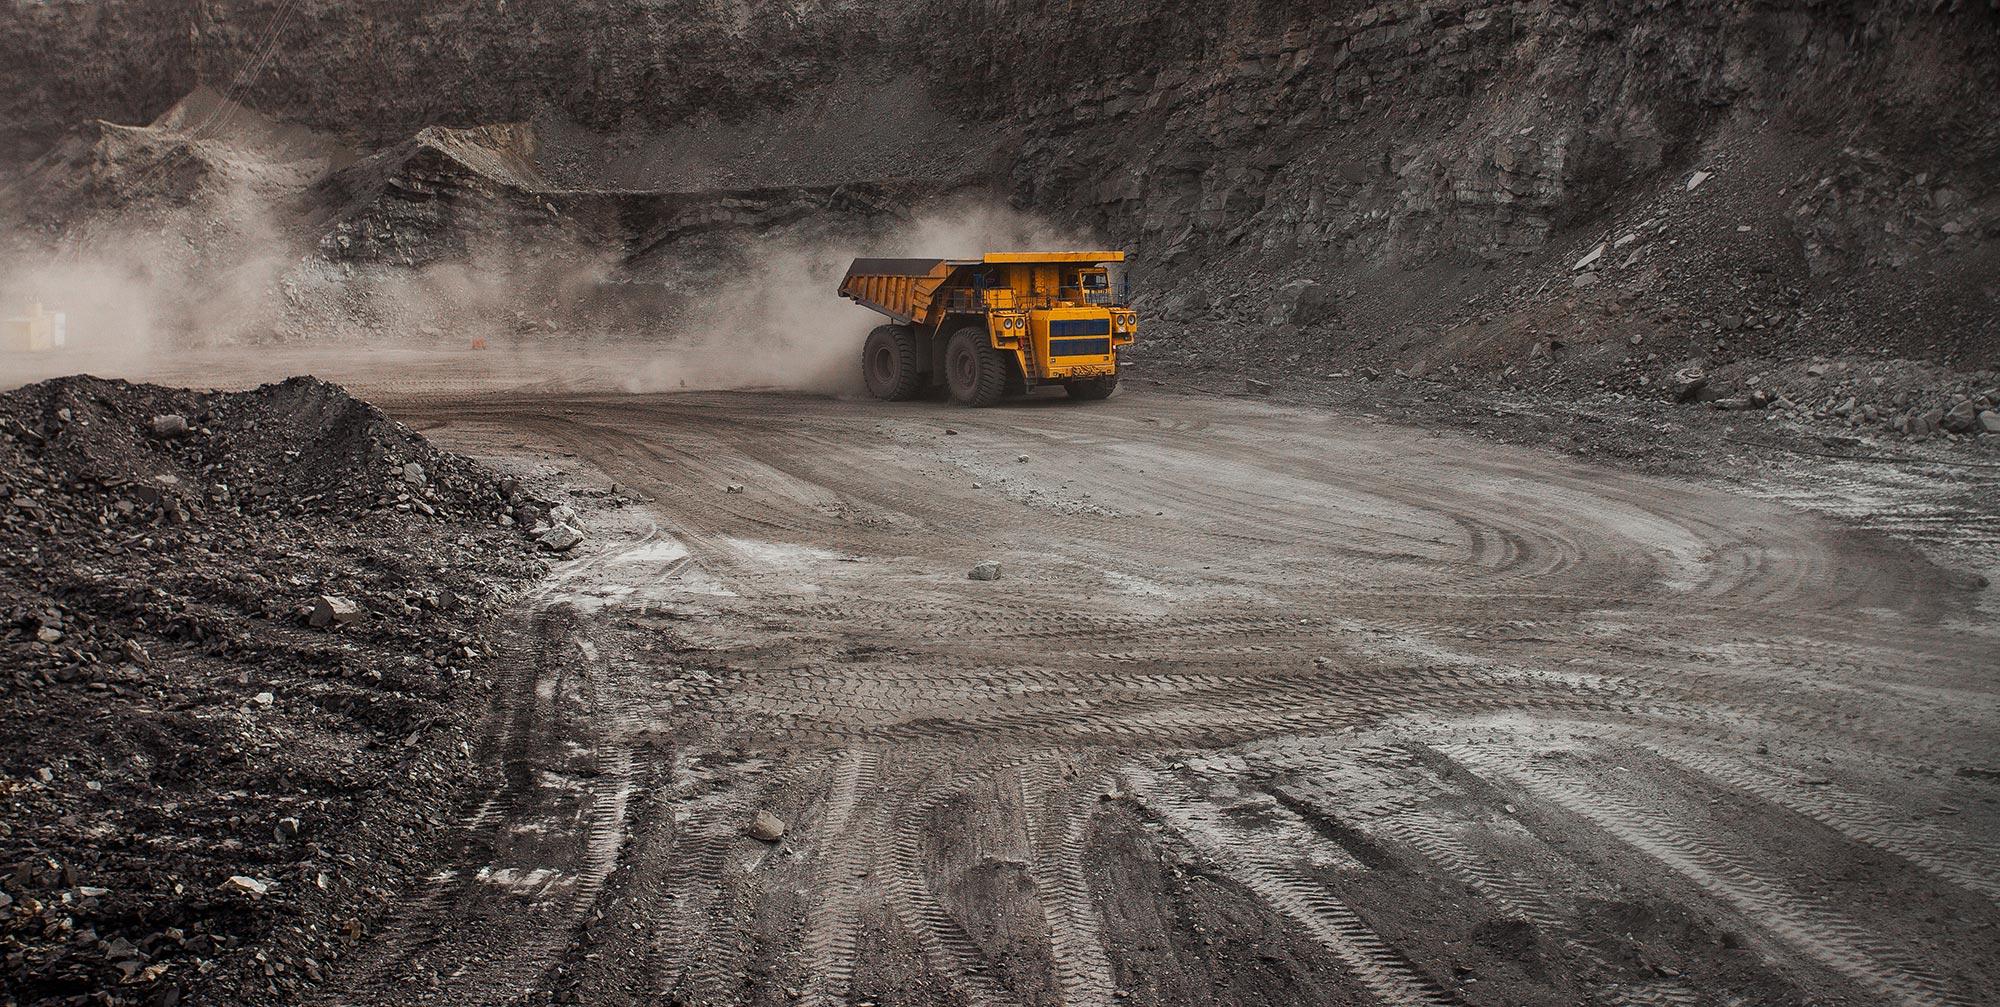 10 innovative companies enabling responsible mining